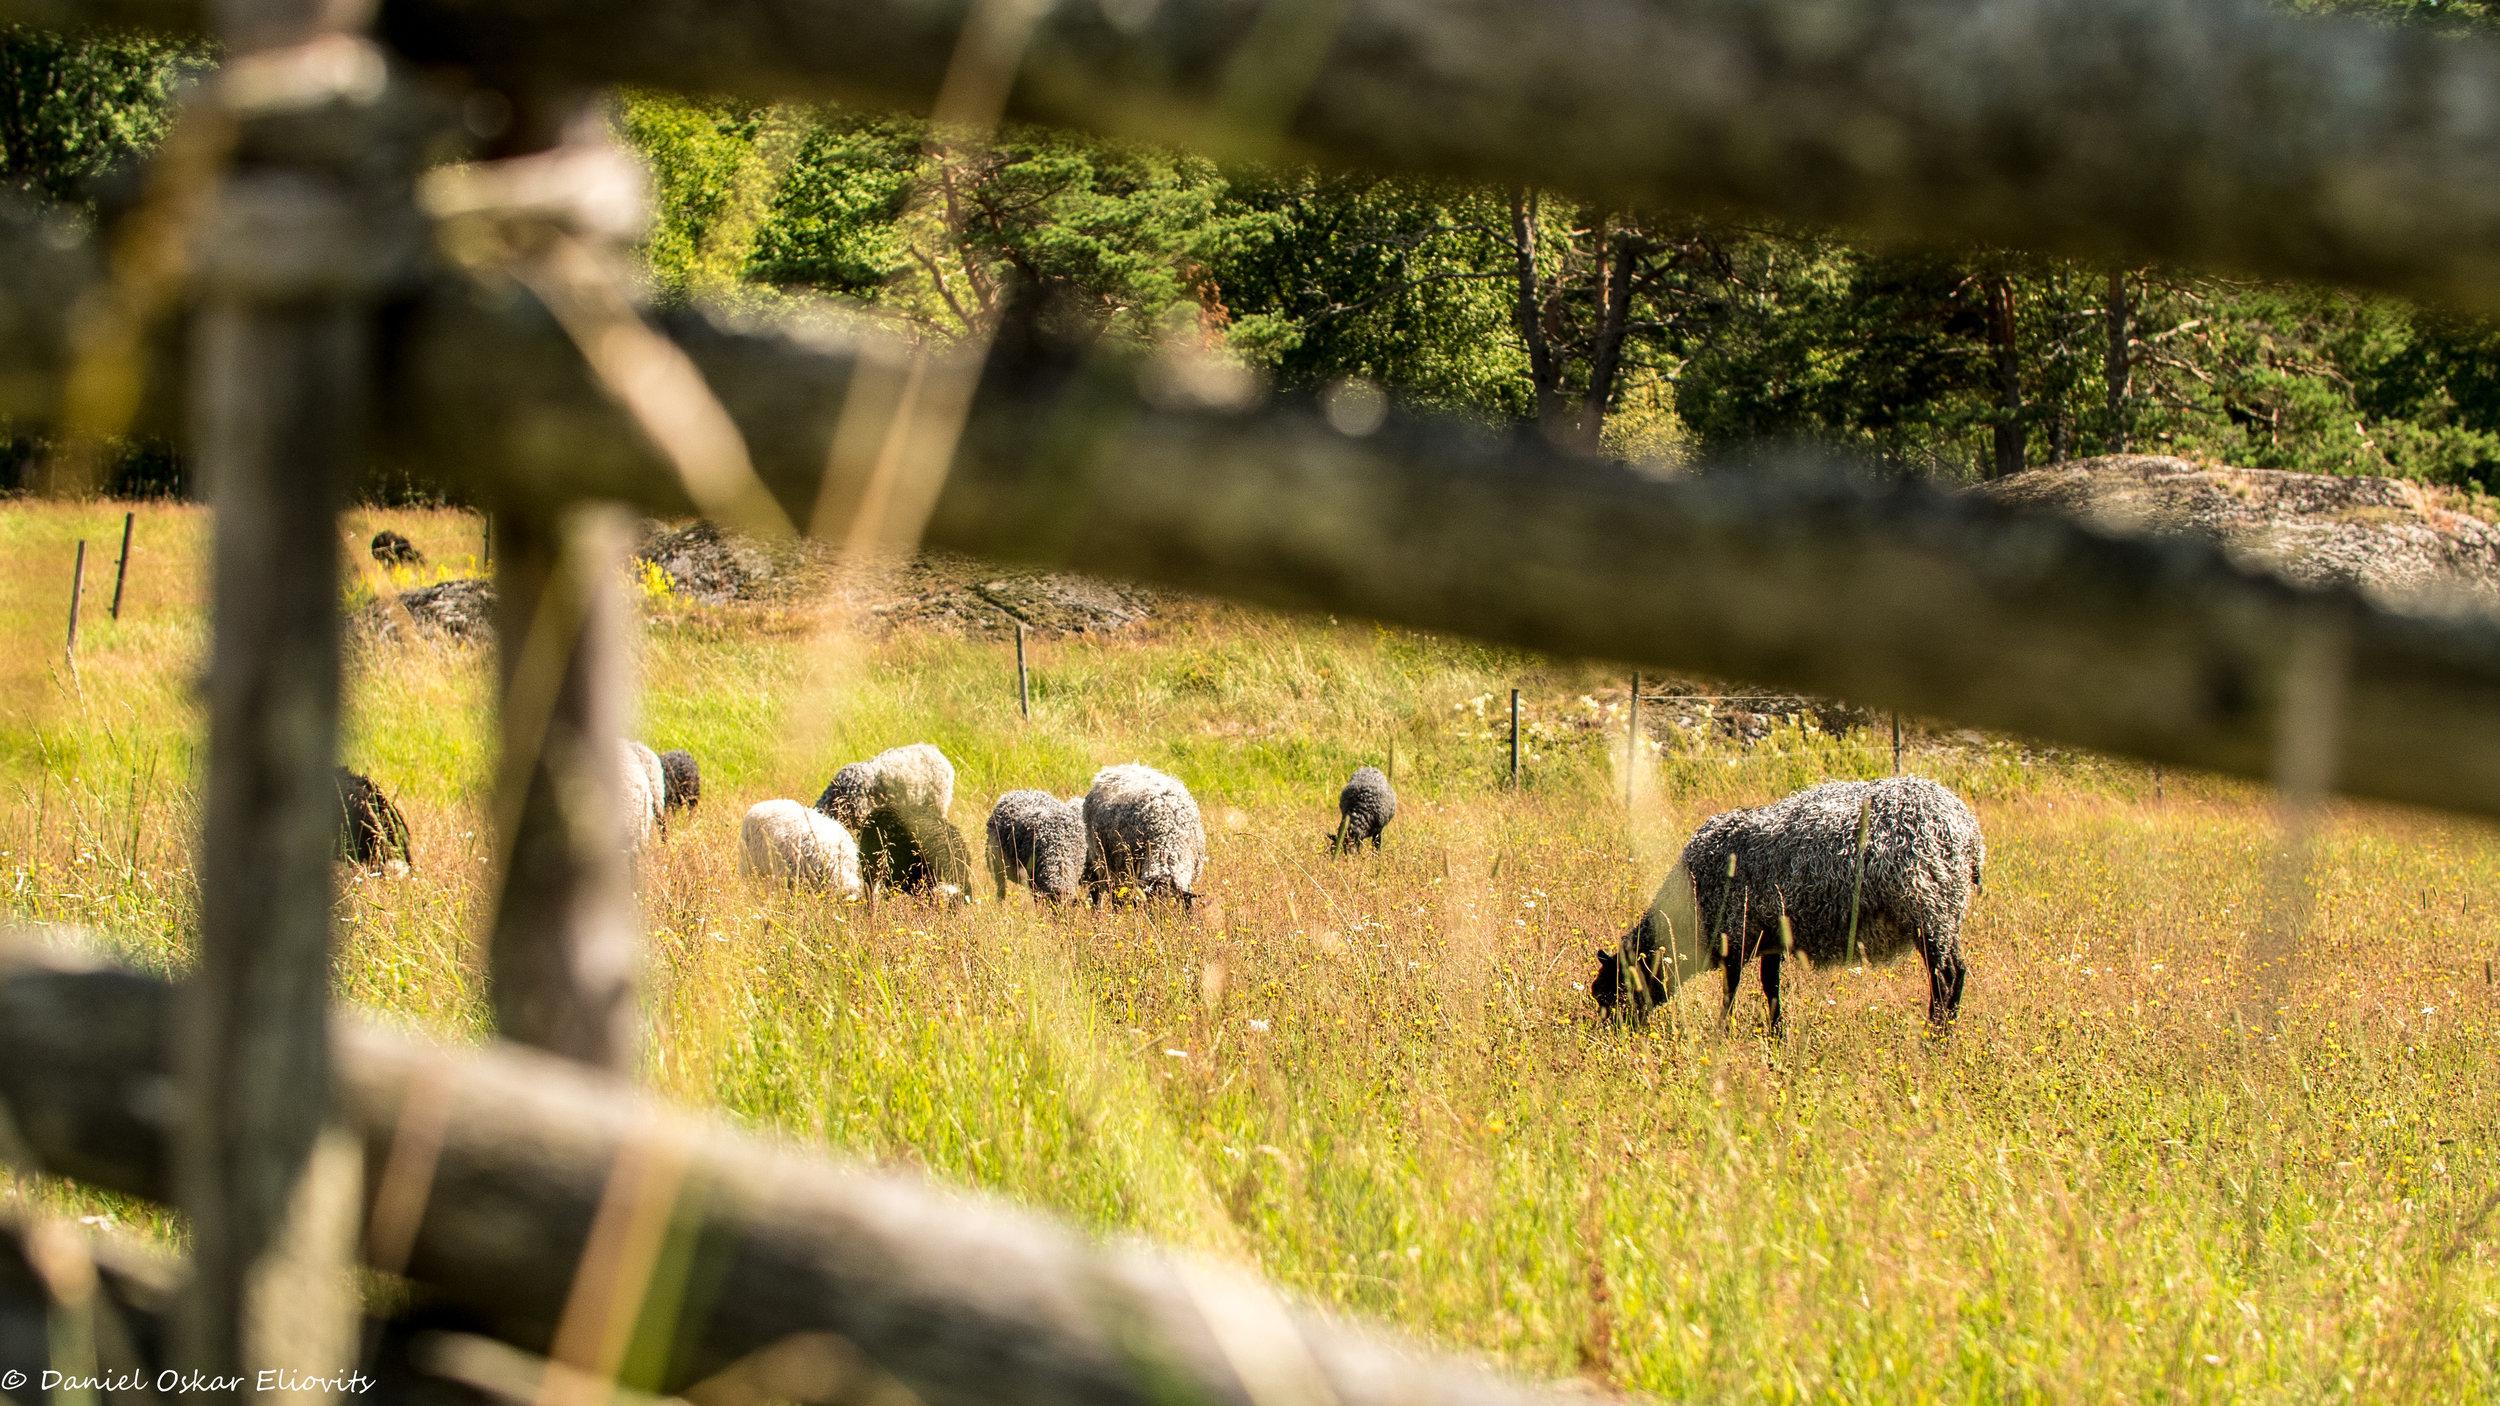 Sheep in Tyresta national park, Sweden